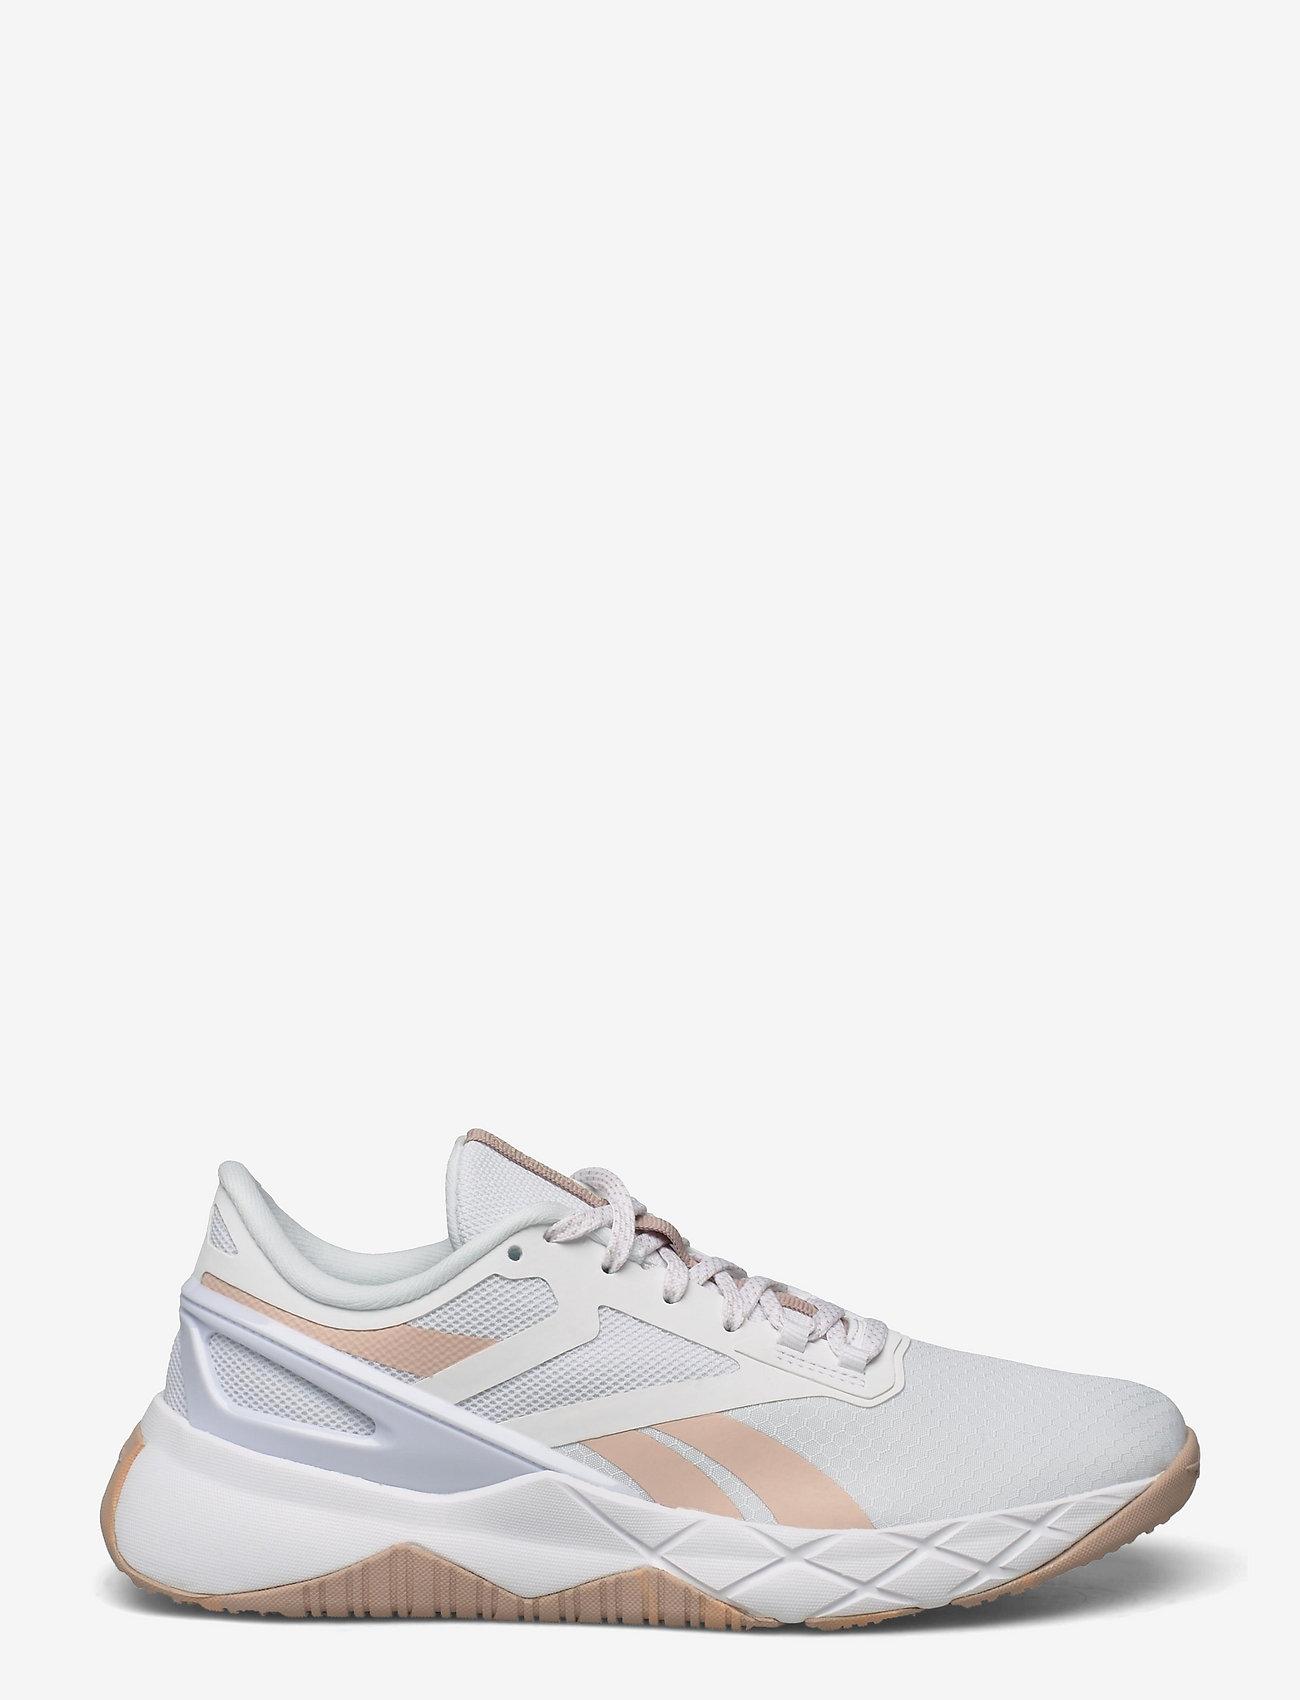 Reebok Performance - NANOFLEX TR - training schoenen - ftwwht/sofecr/rosgol - 1